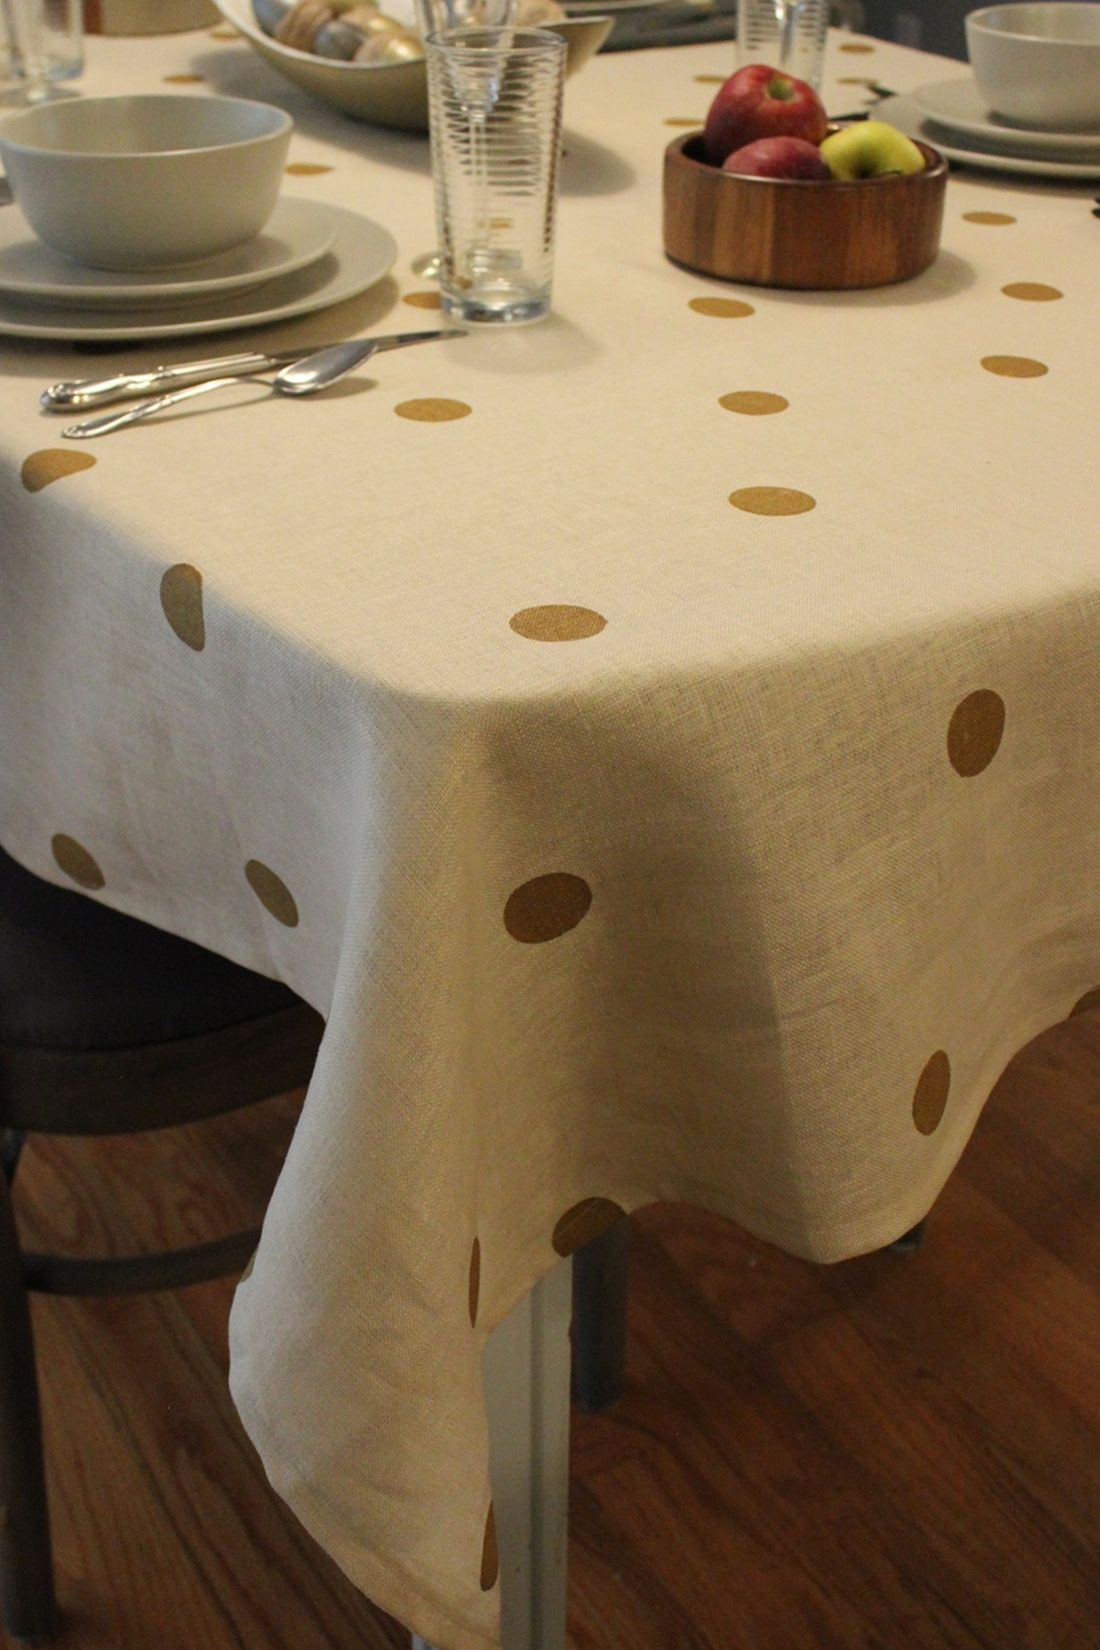 DIY Polka Dot Tablecloth Tutorial